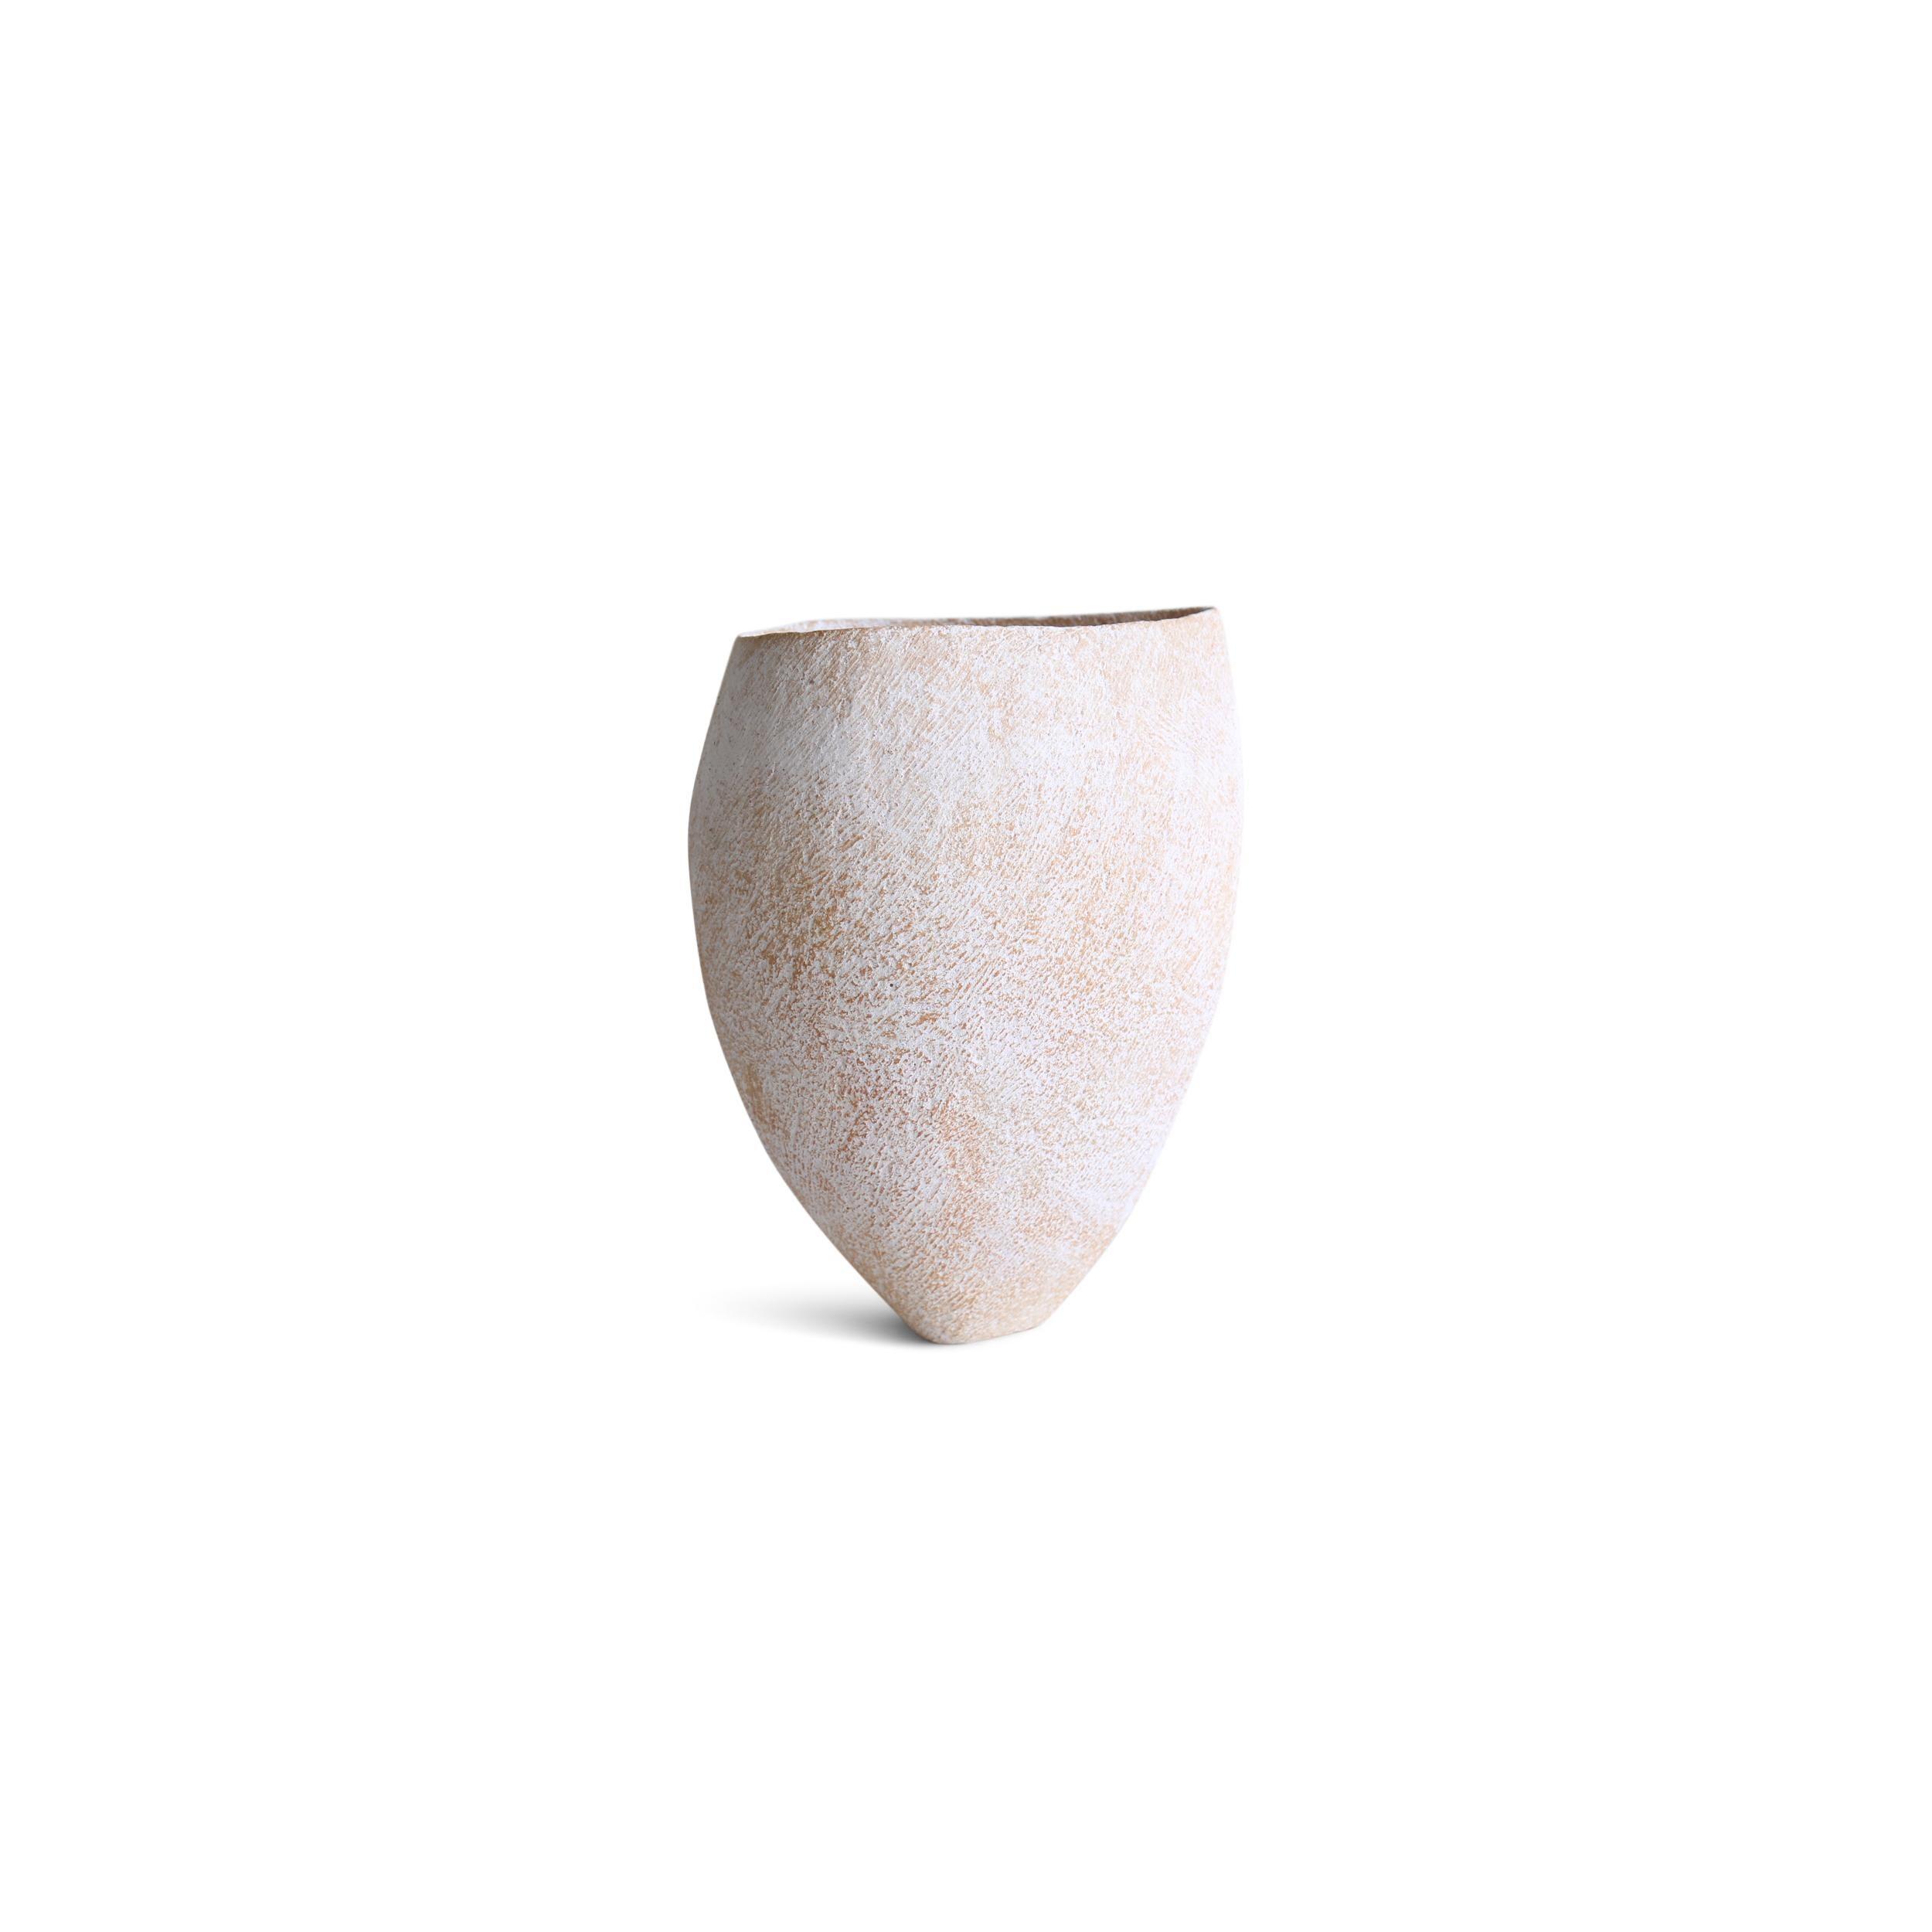 Pergamon 4 -Lithic Collection